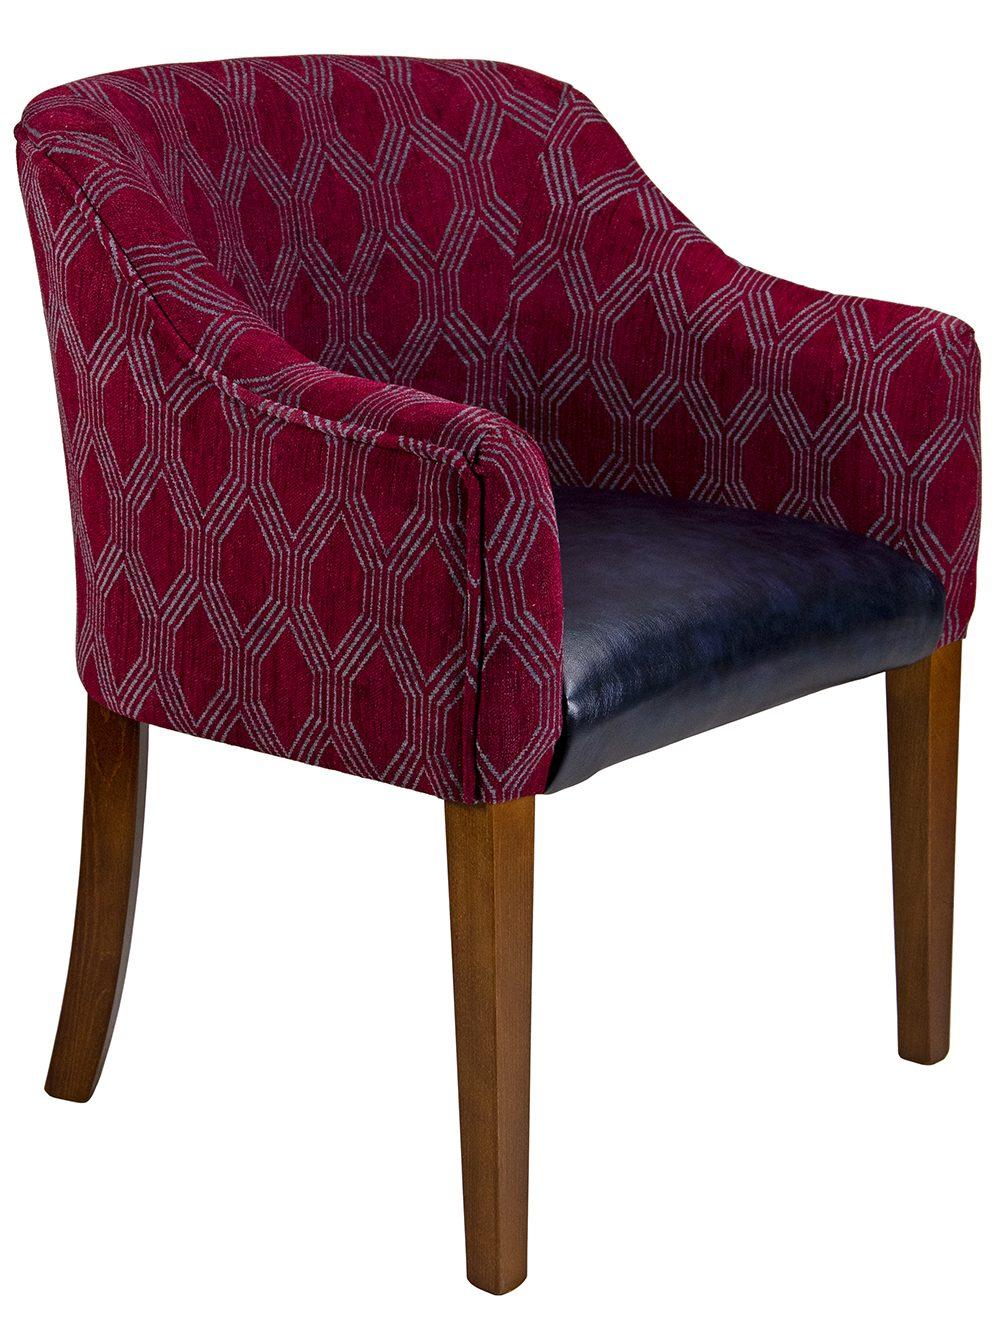 Custom Jenny Tub Chairs